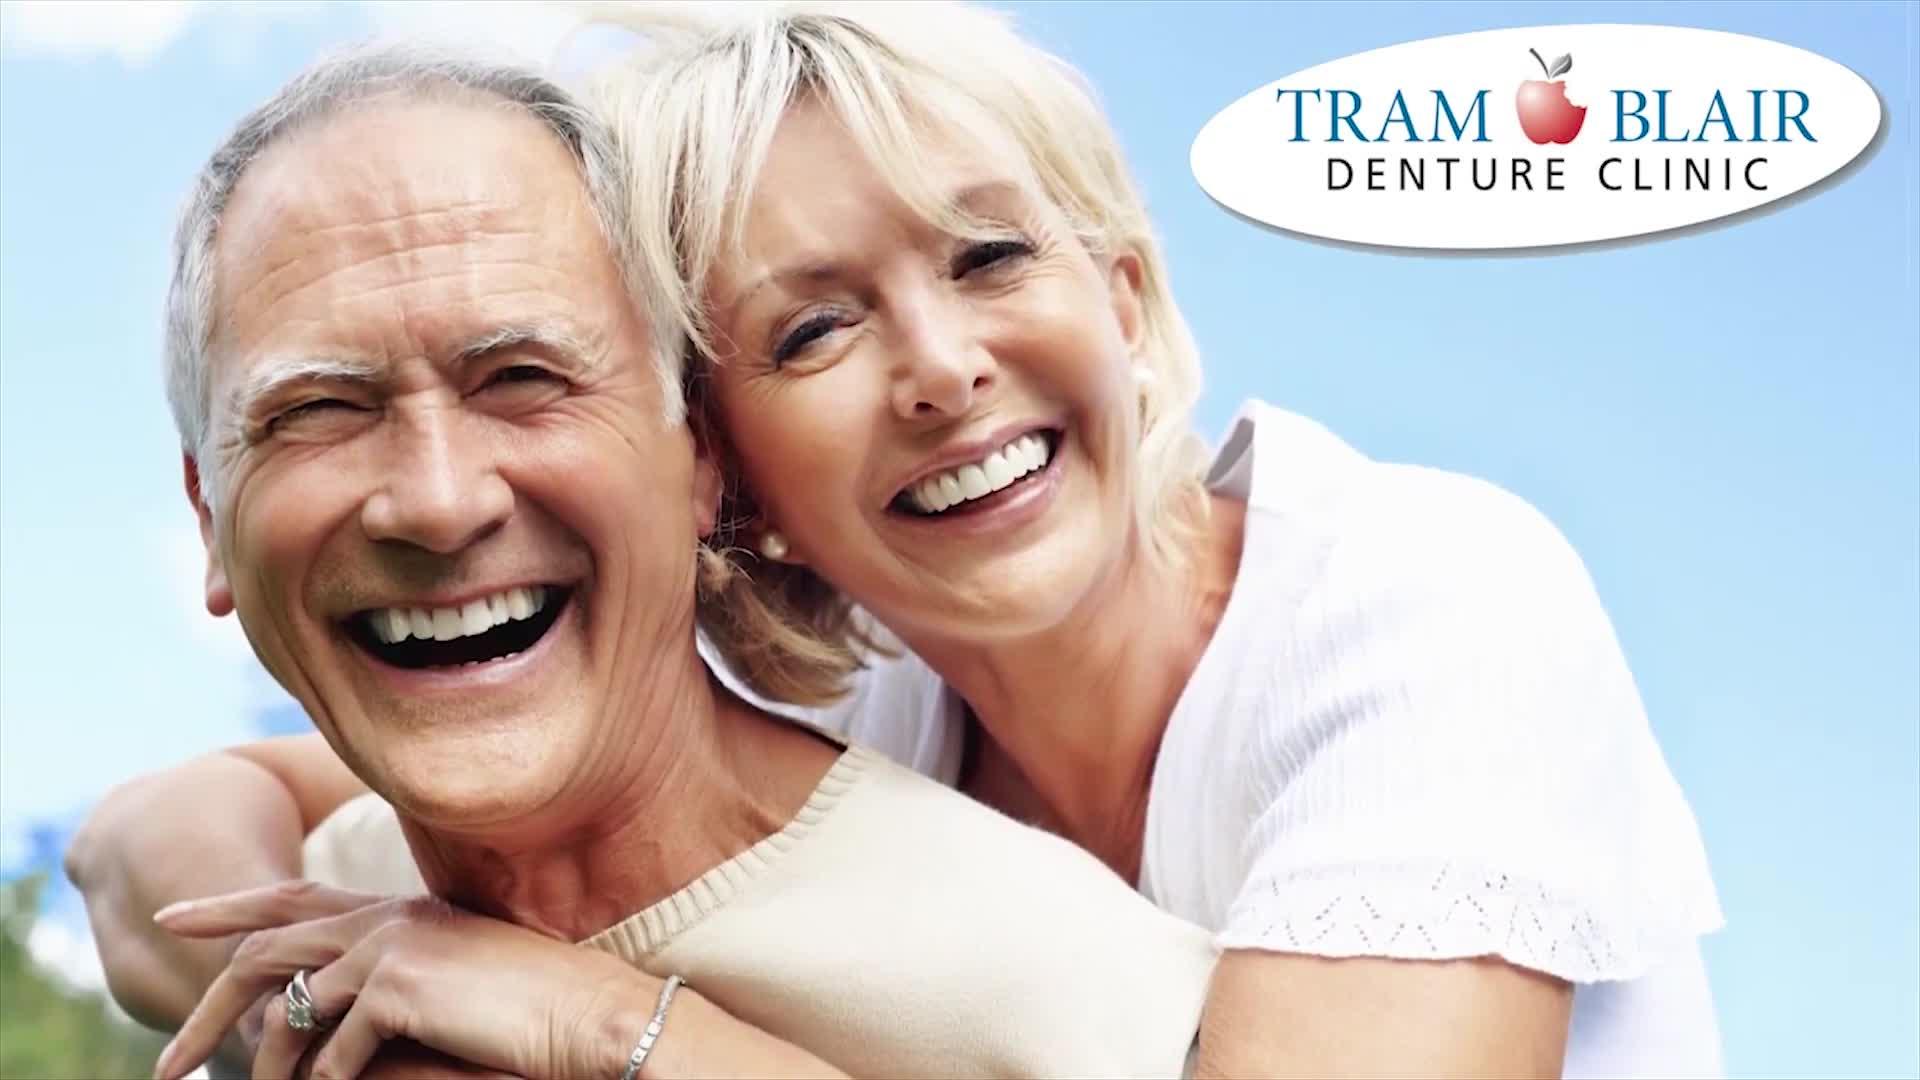 Tram-Blair Denture Clinic - Insomnia, Apnea & Other Sleep Disorders - 2262434976